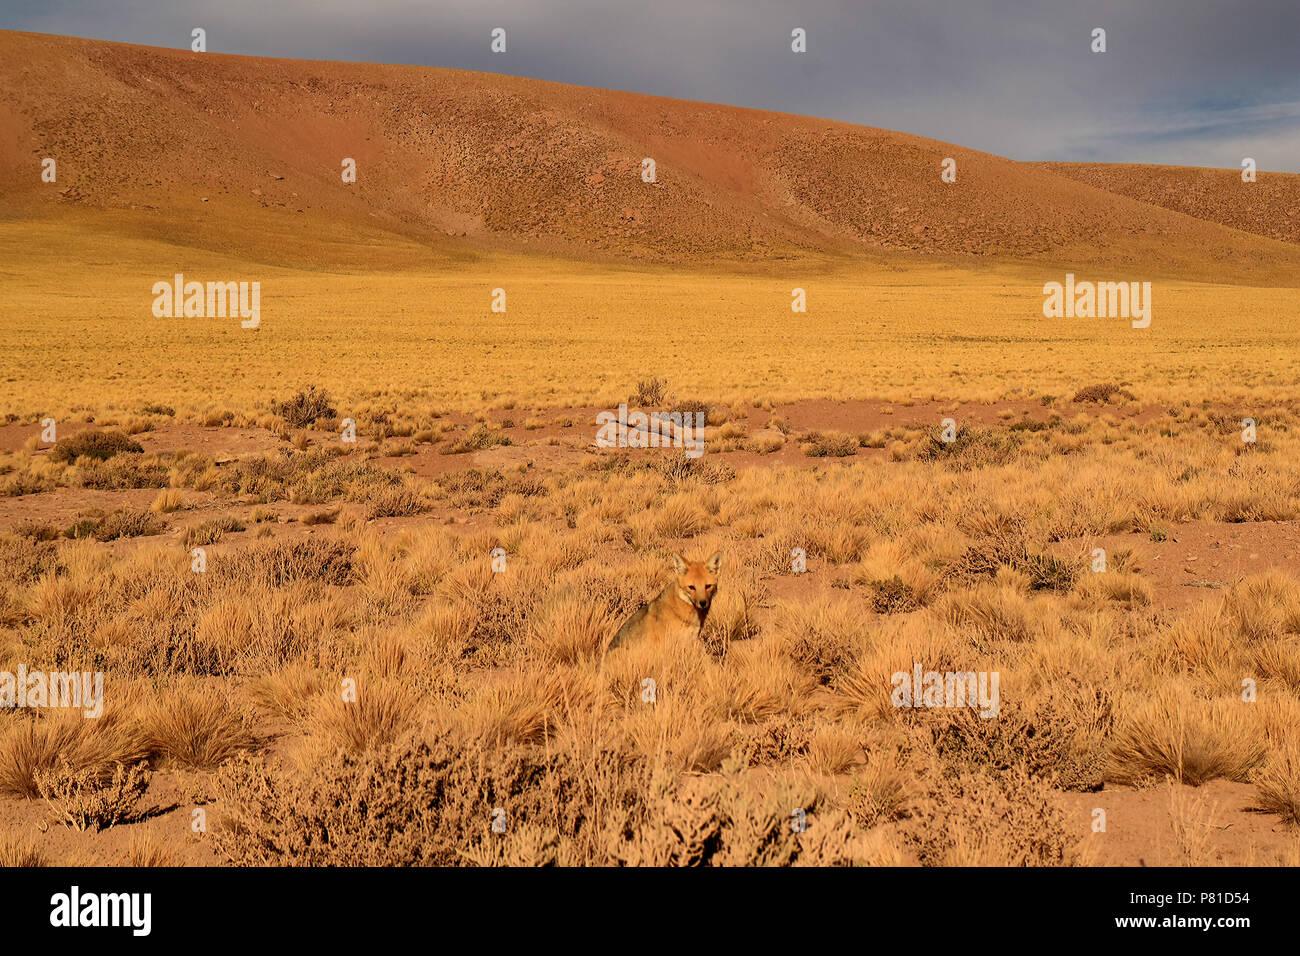 One Little Andean Fox Relaxing in the Desert Brush Field, Atacama Desert of Northern Chile - Stock Image